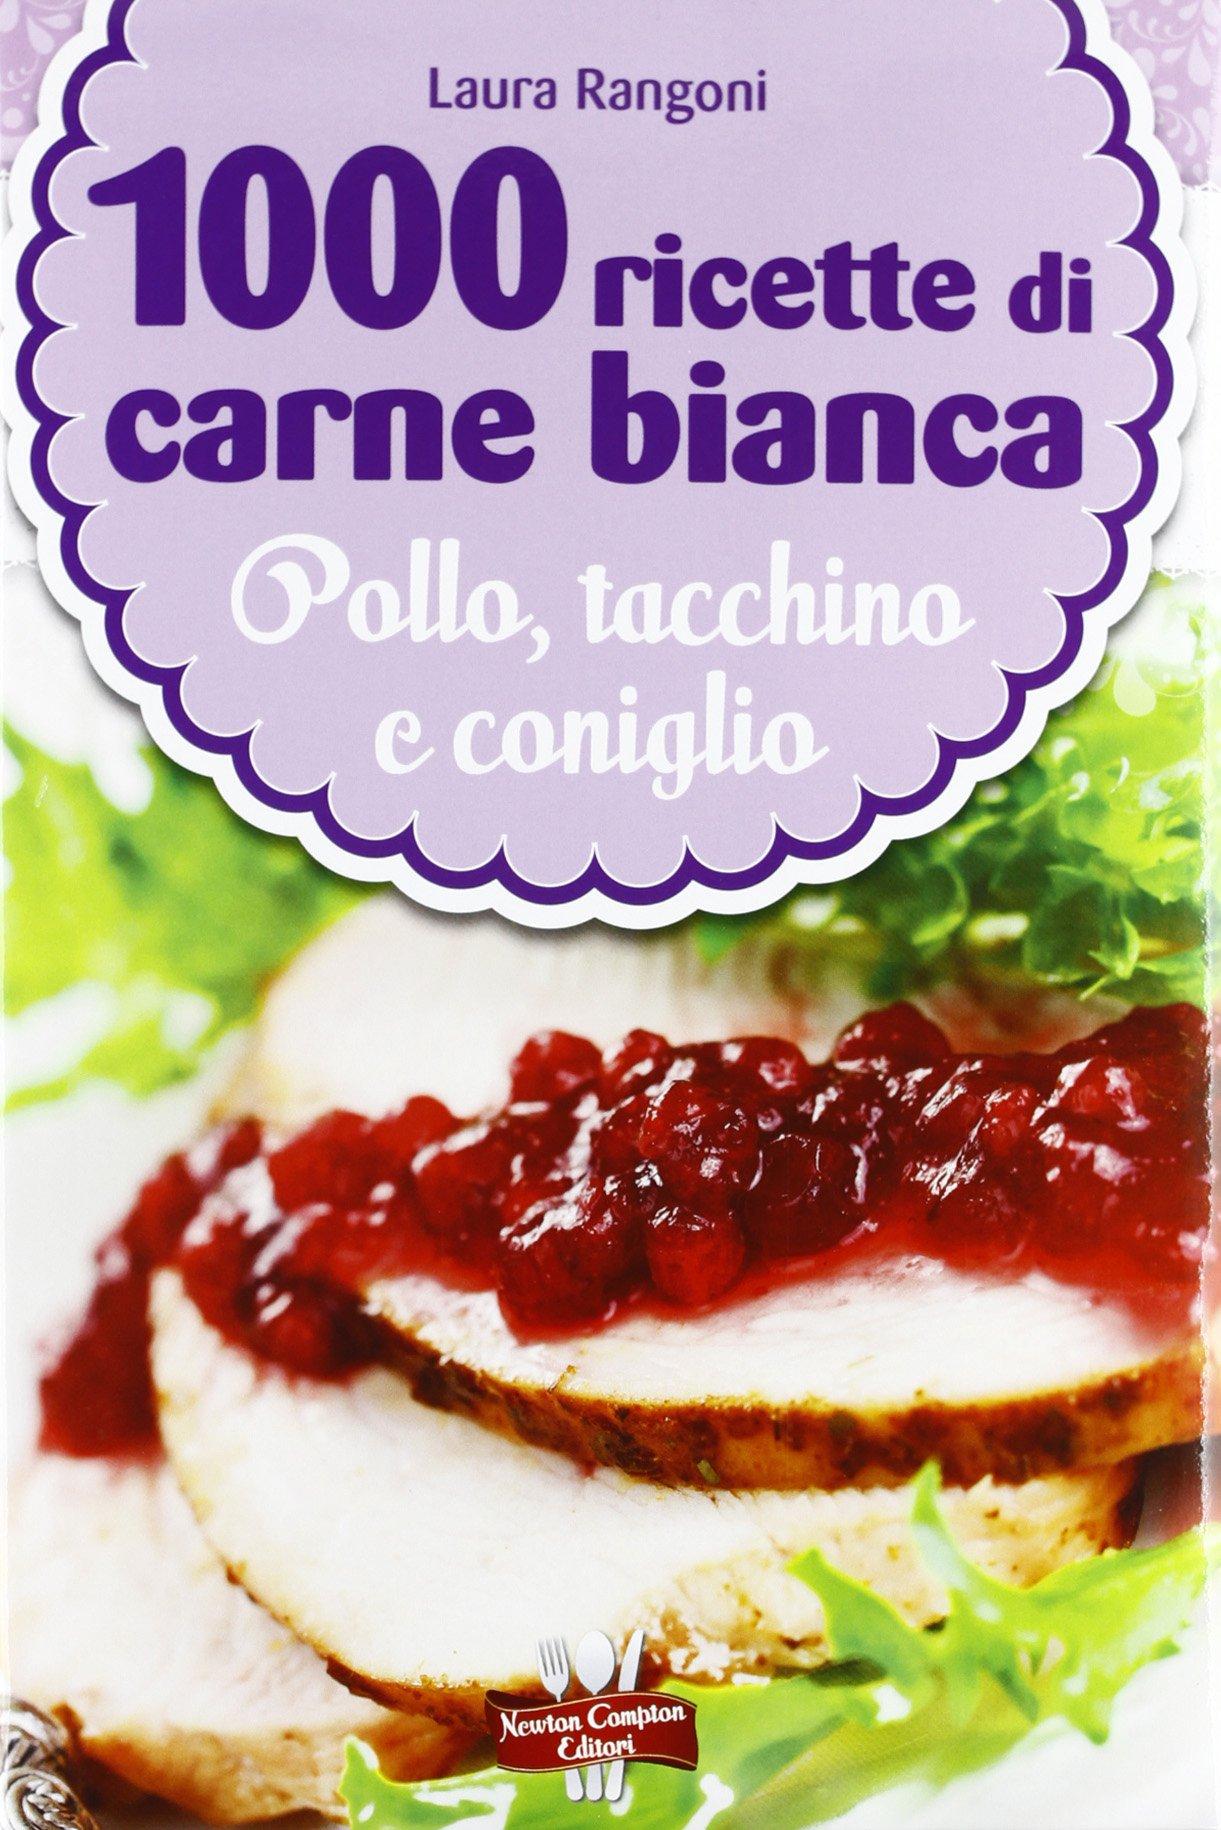 1000 ricette di carne bianca Copertina rigida – 10 gen 2013 Laura Rangoni Newton Compton 8854144657 Cucina